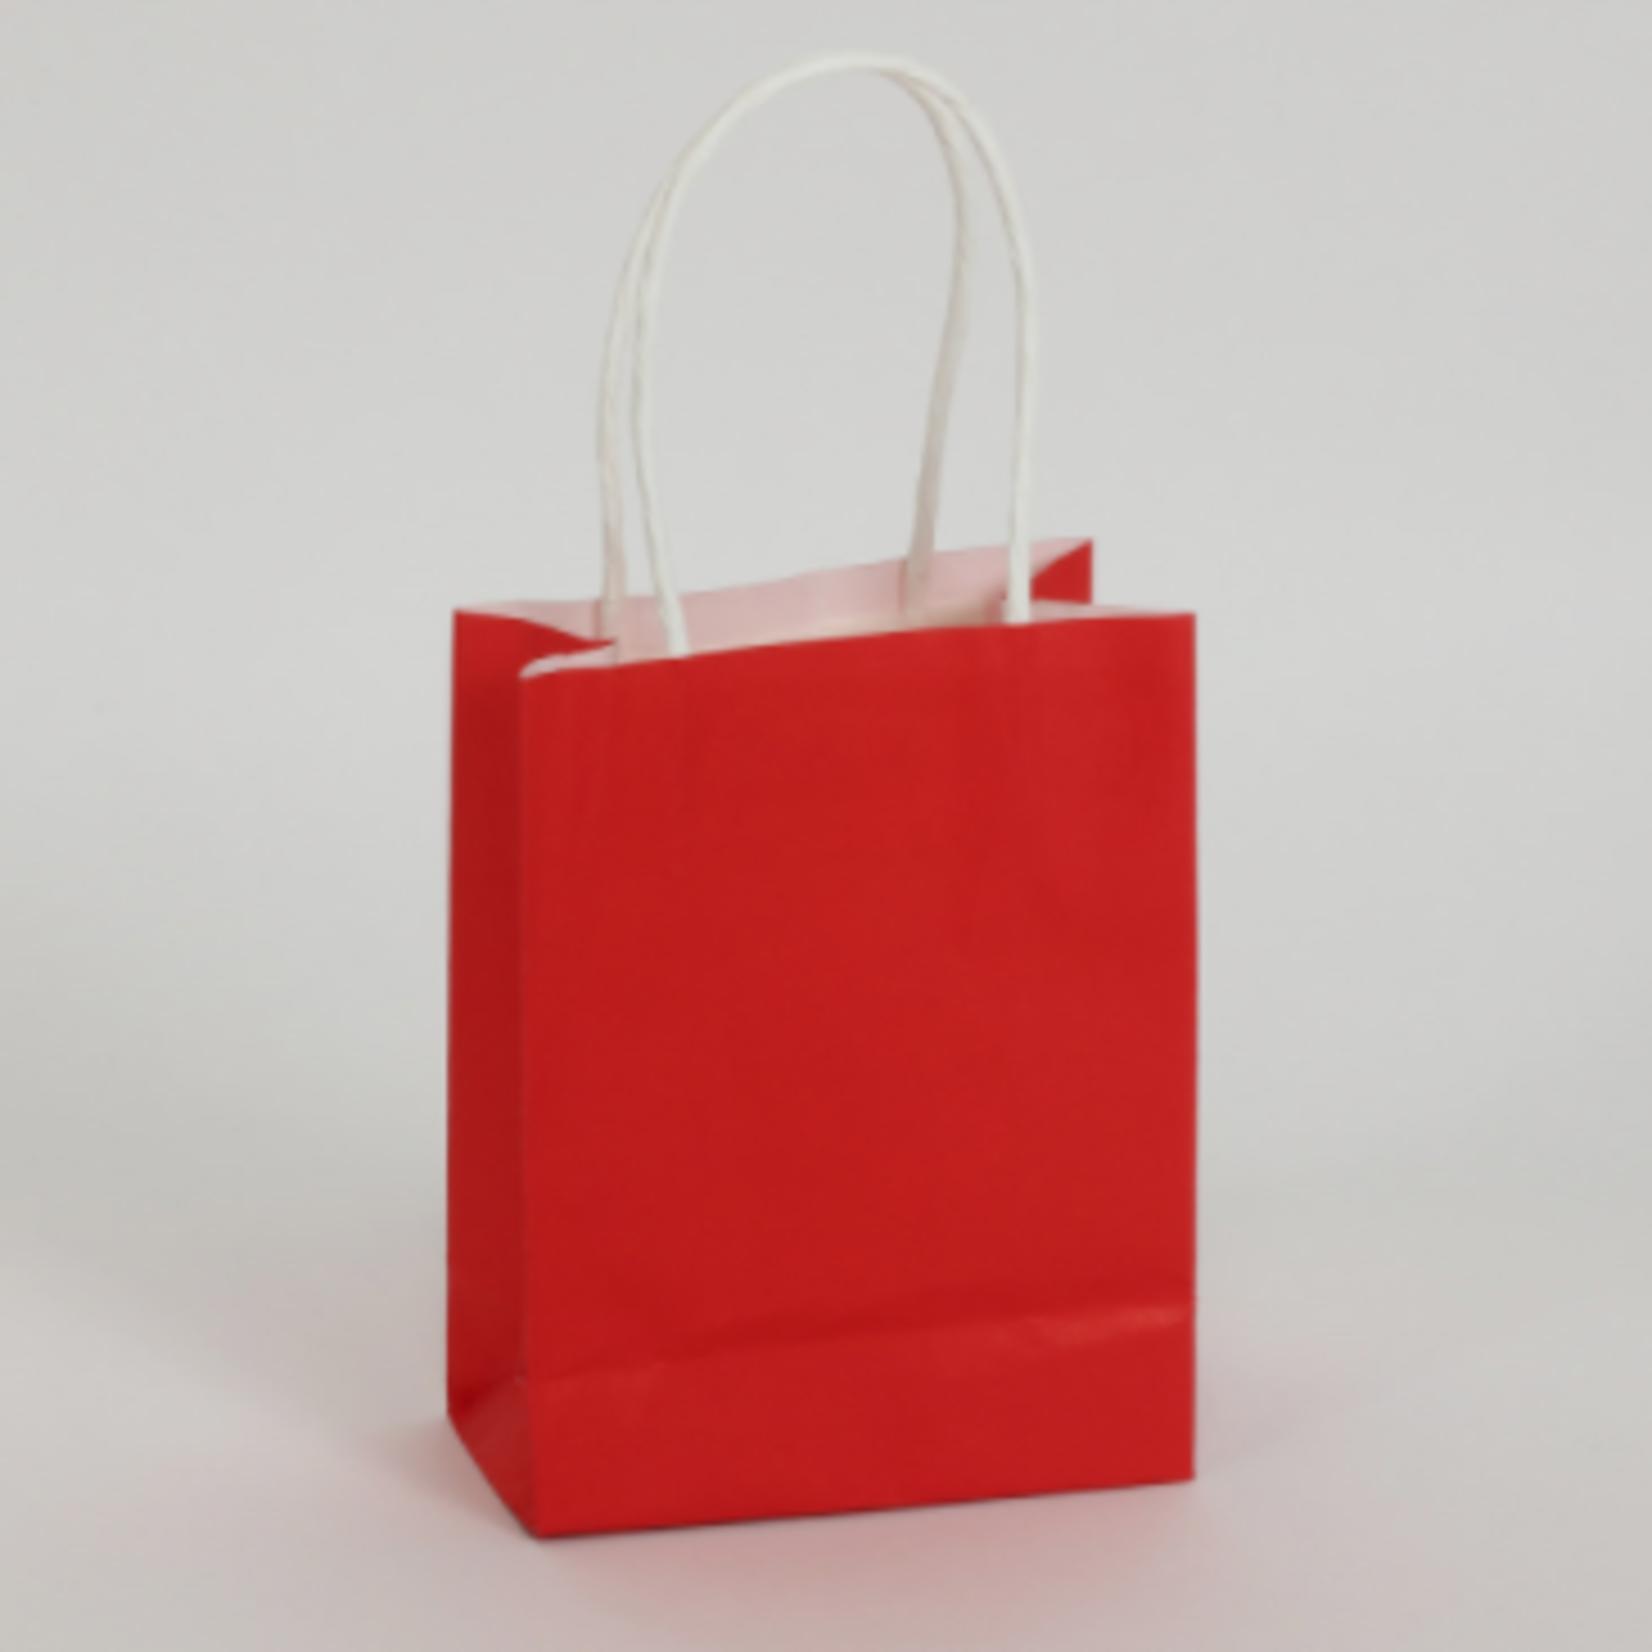 4.5 X 5.5'' 1 DZ TREAT BAGS